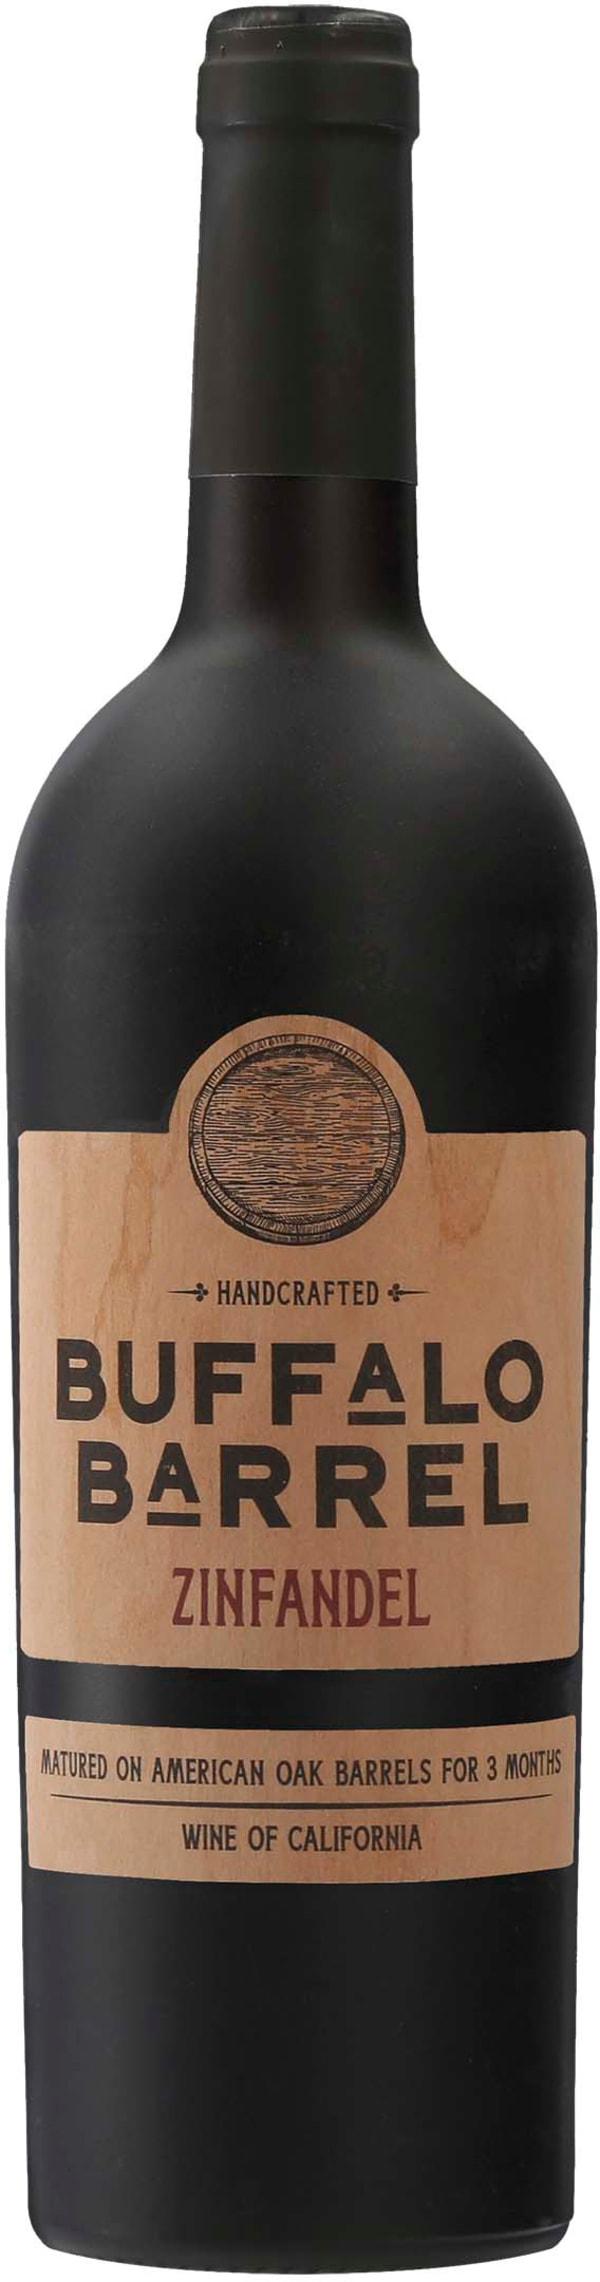 Buffalo Barrel Bourbon Barrel Aged Zinfandel 2016